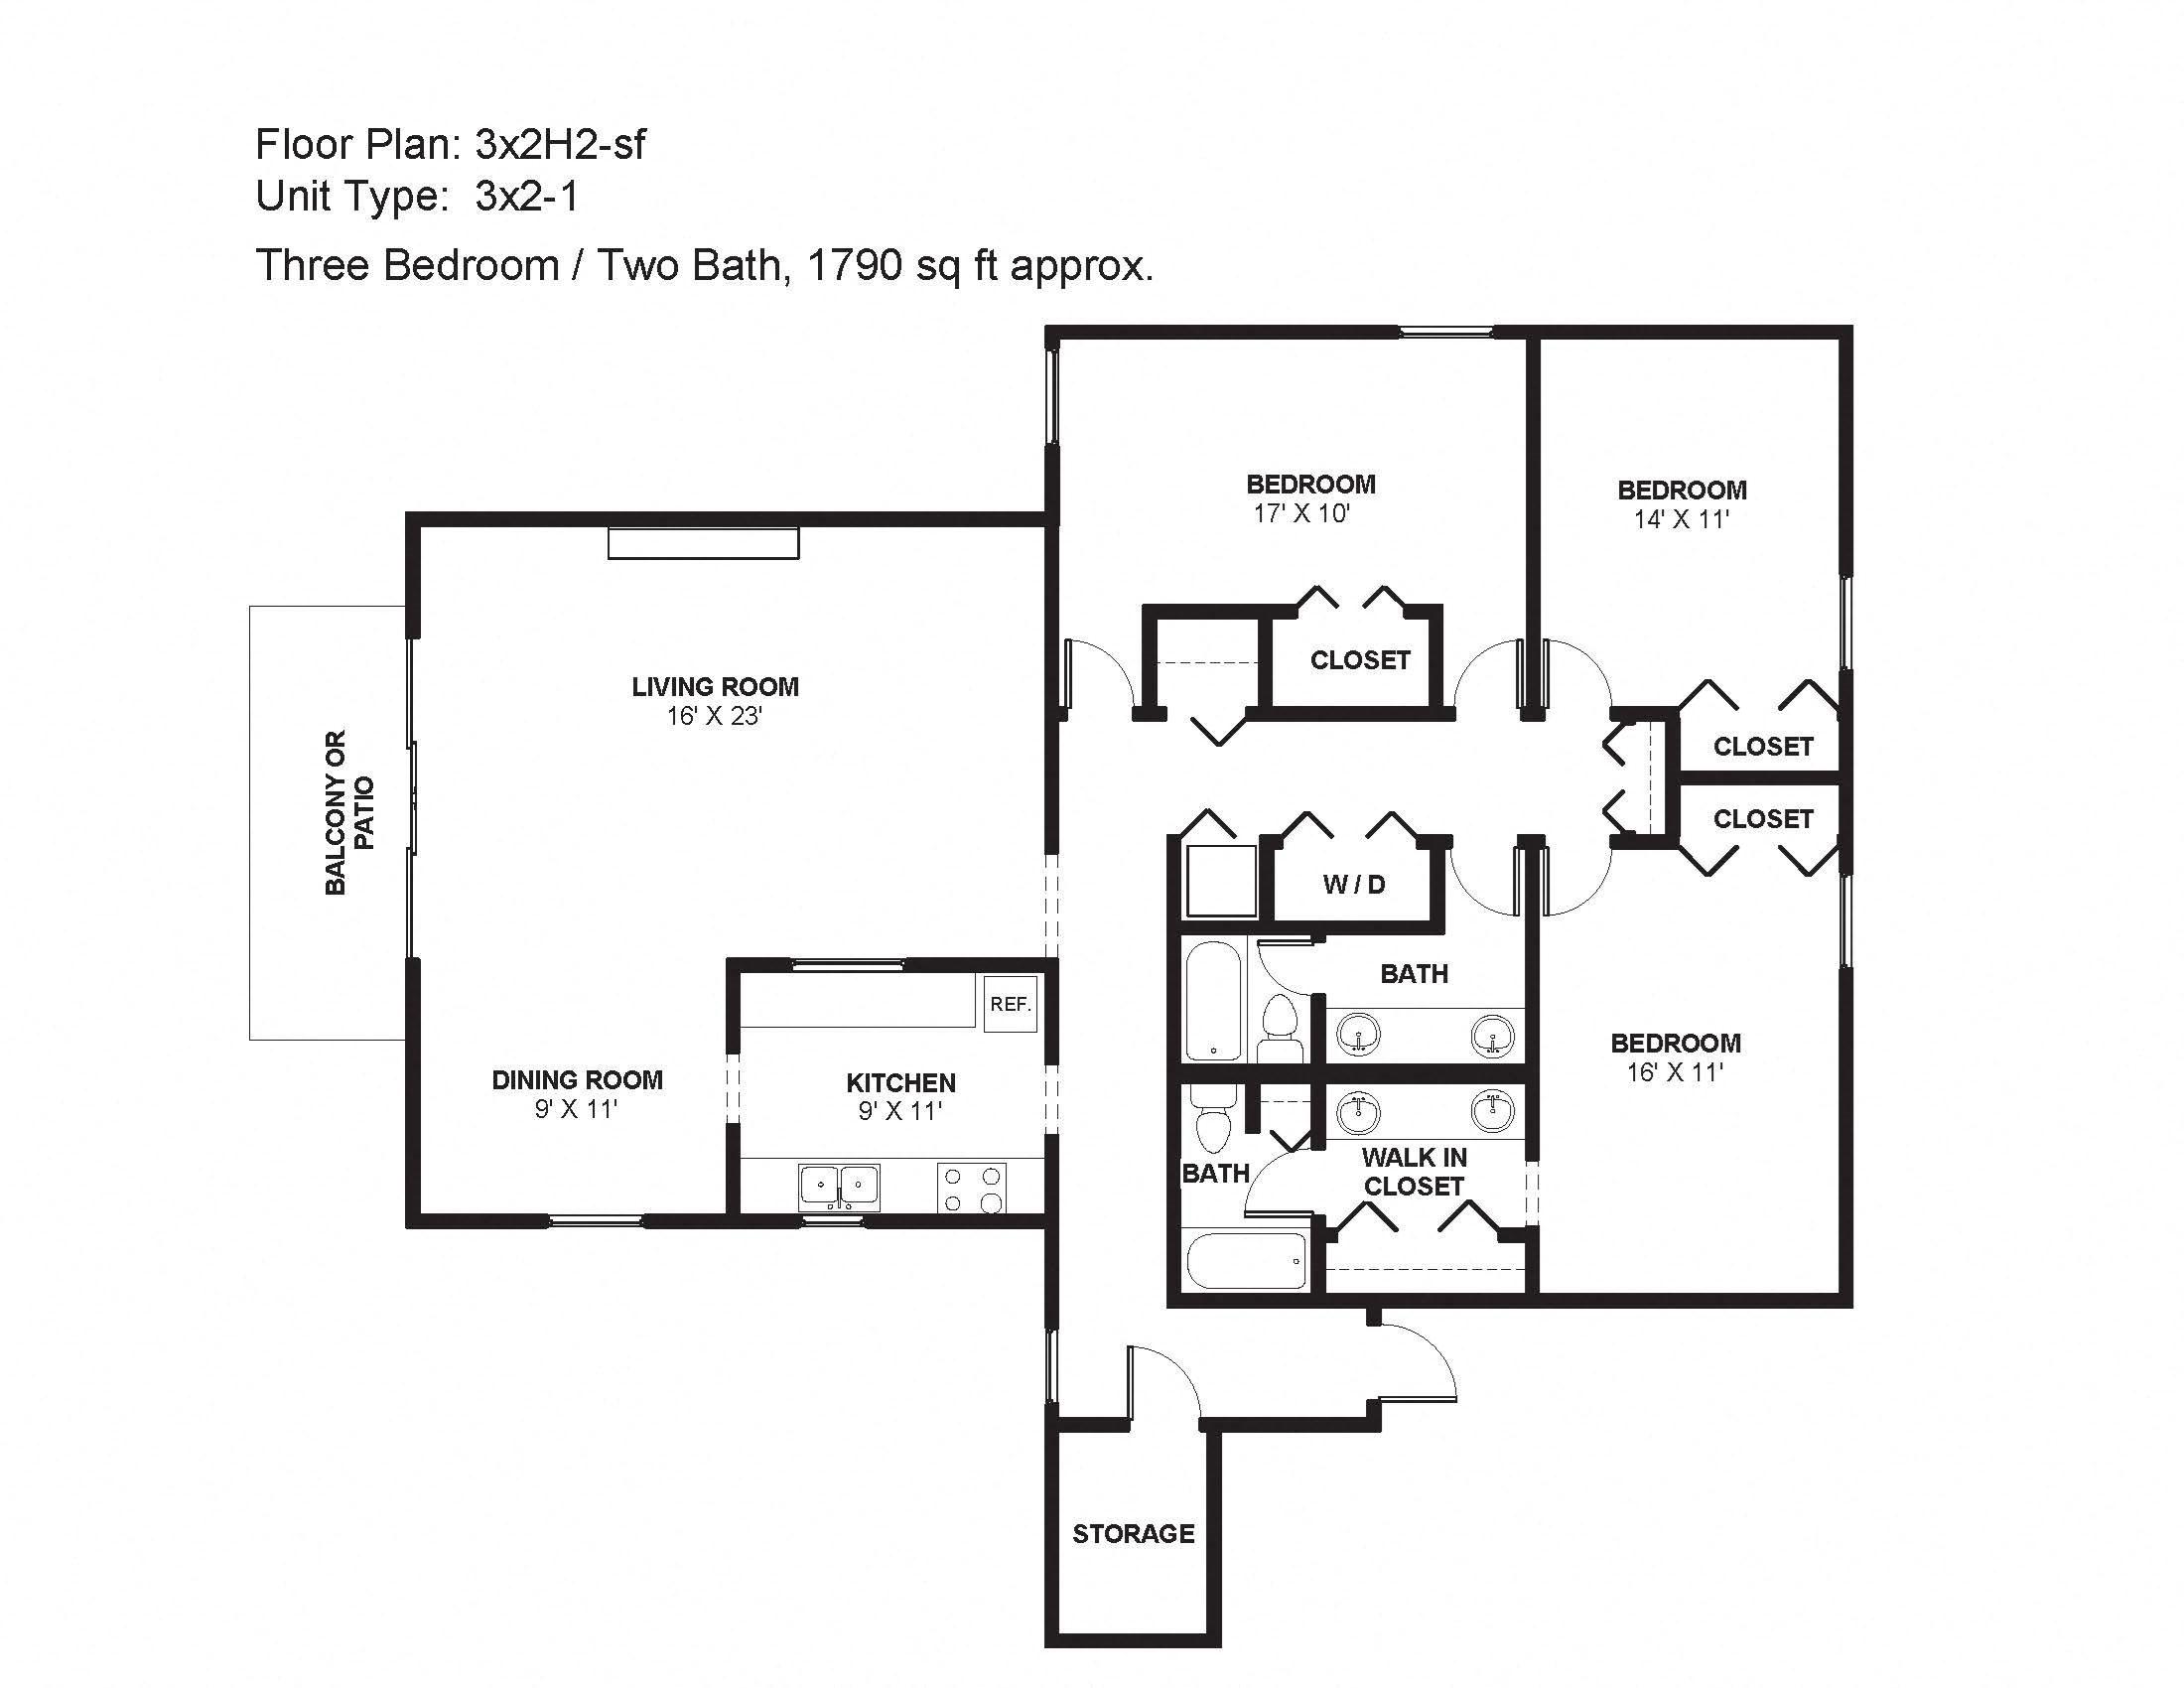 3x2H2-sf Floor Plan 35